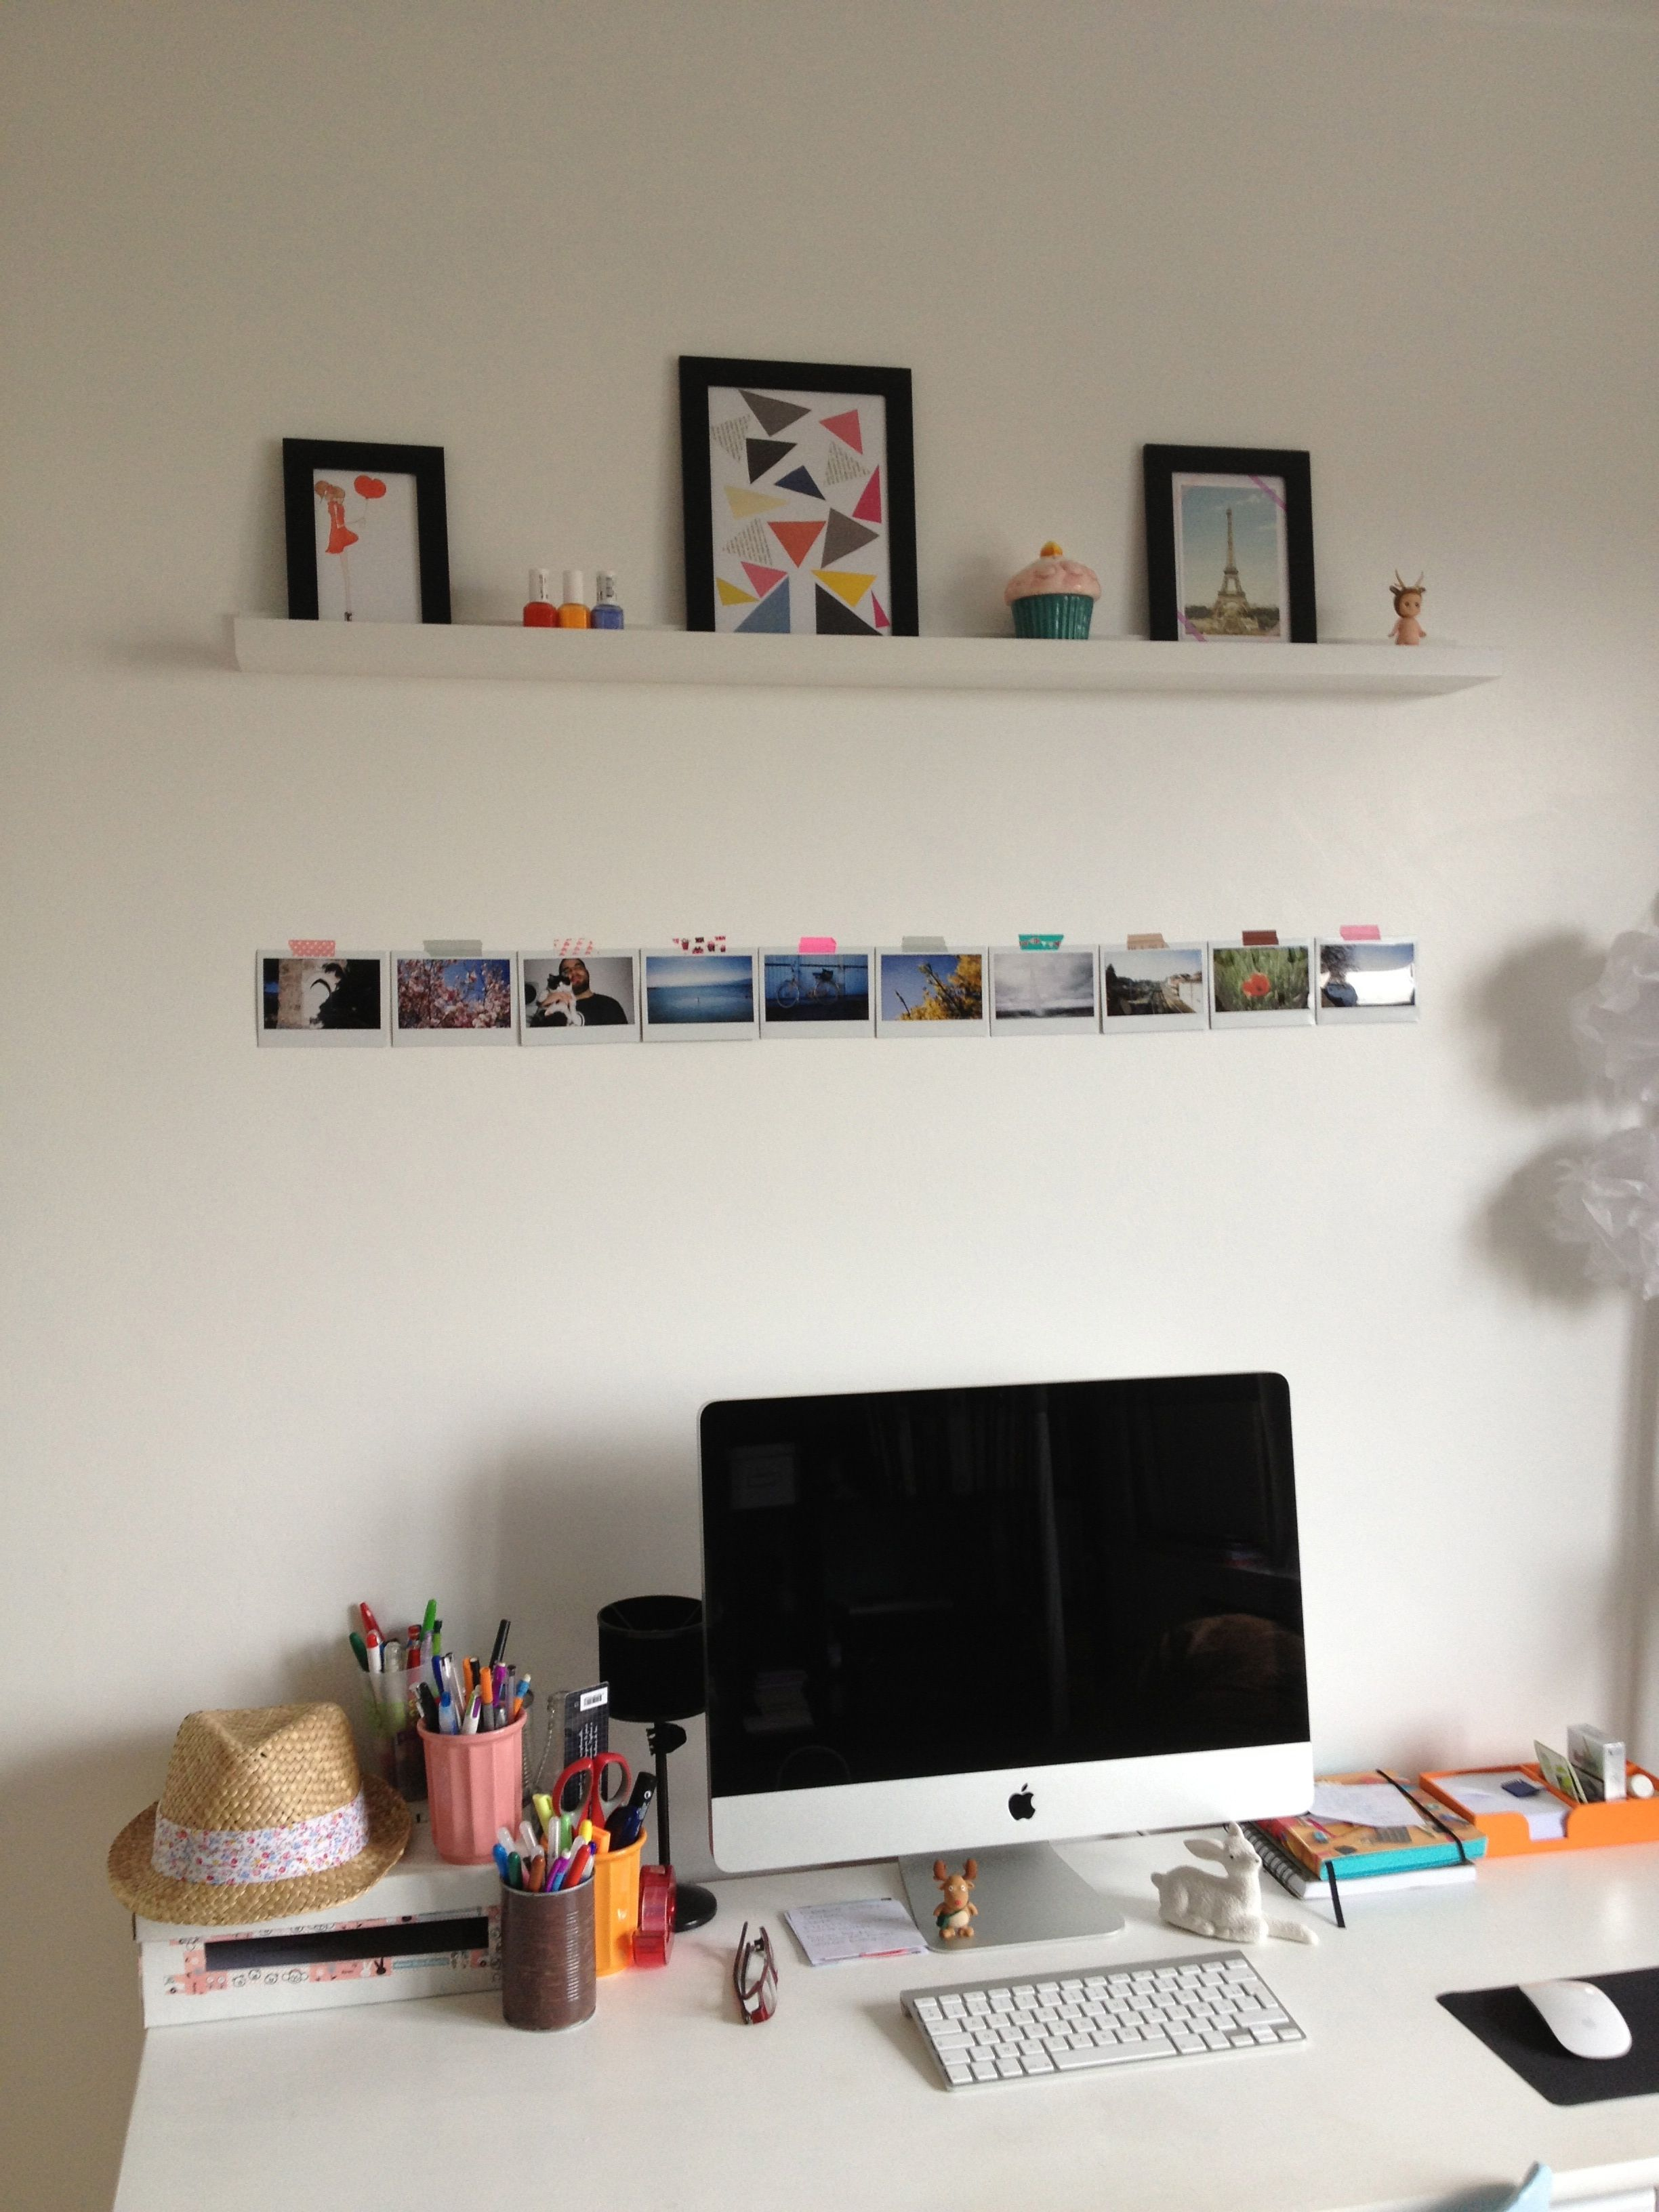 bureau vintage id es d co pastel etag re cadres multiples sonny angel home pinterest. Black Bedroom Furniture Sets. Home Design Ideas